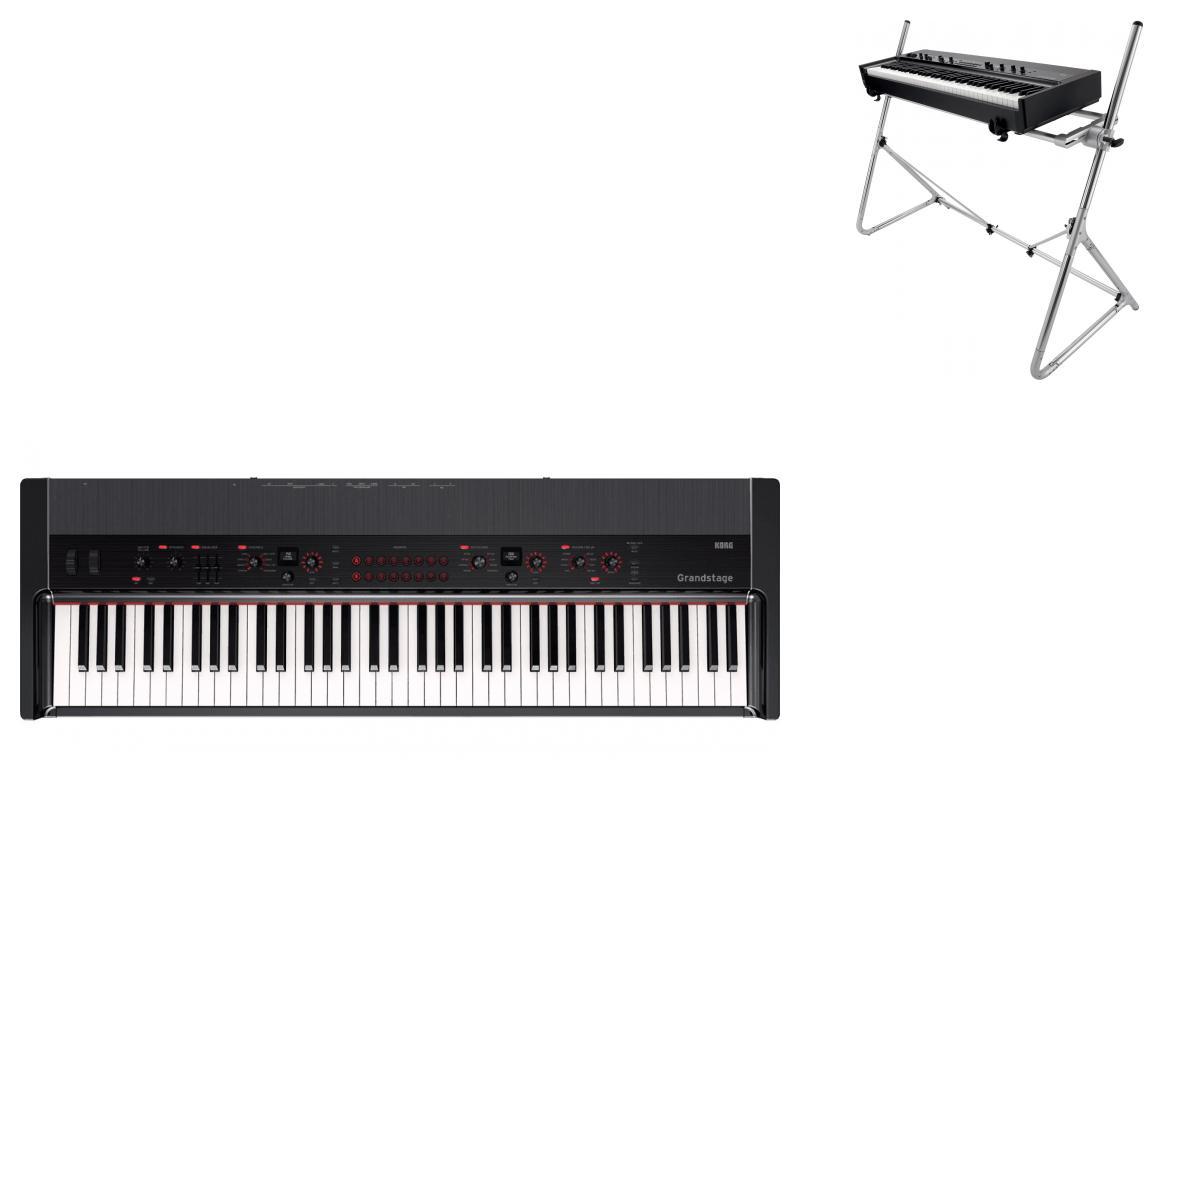 clavier de sc ne compact 73 notes nord ns2 76 piano. Black Bedroom Furniture Sets. Home Design Ideas